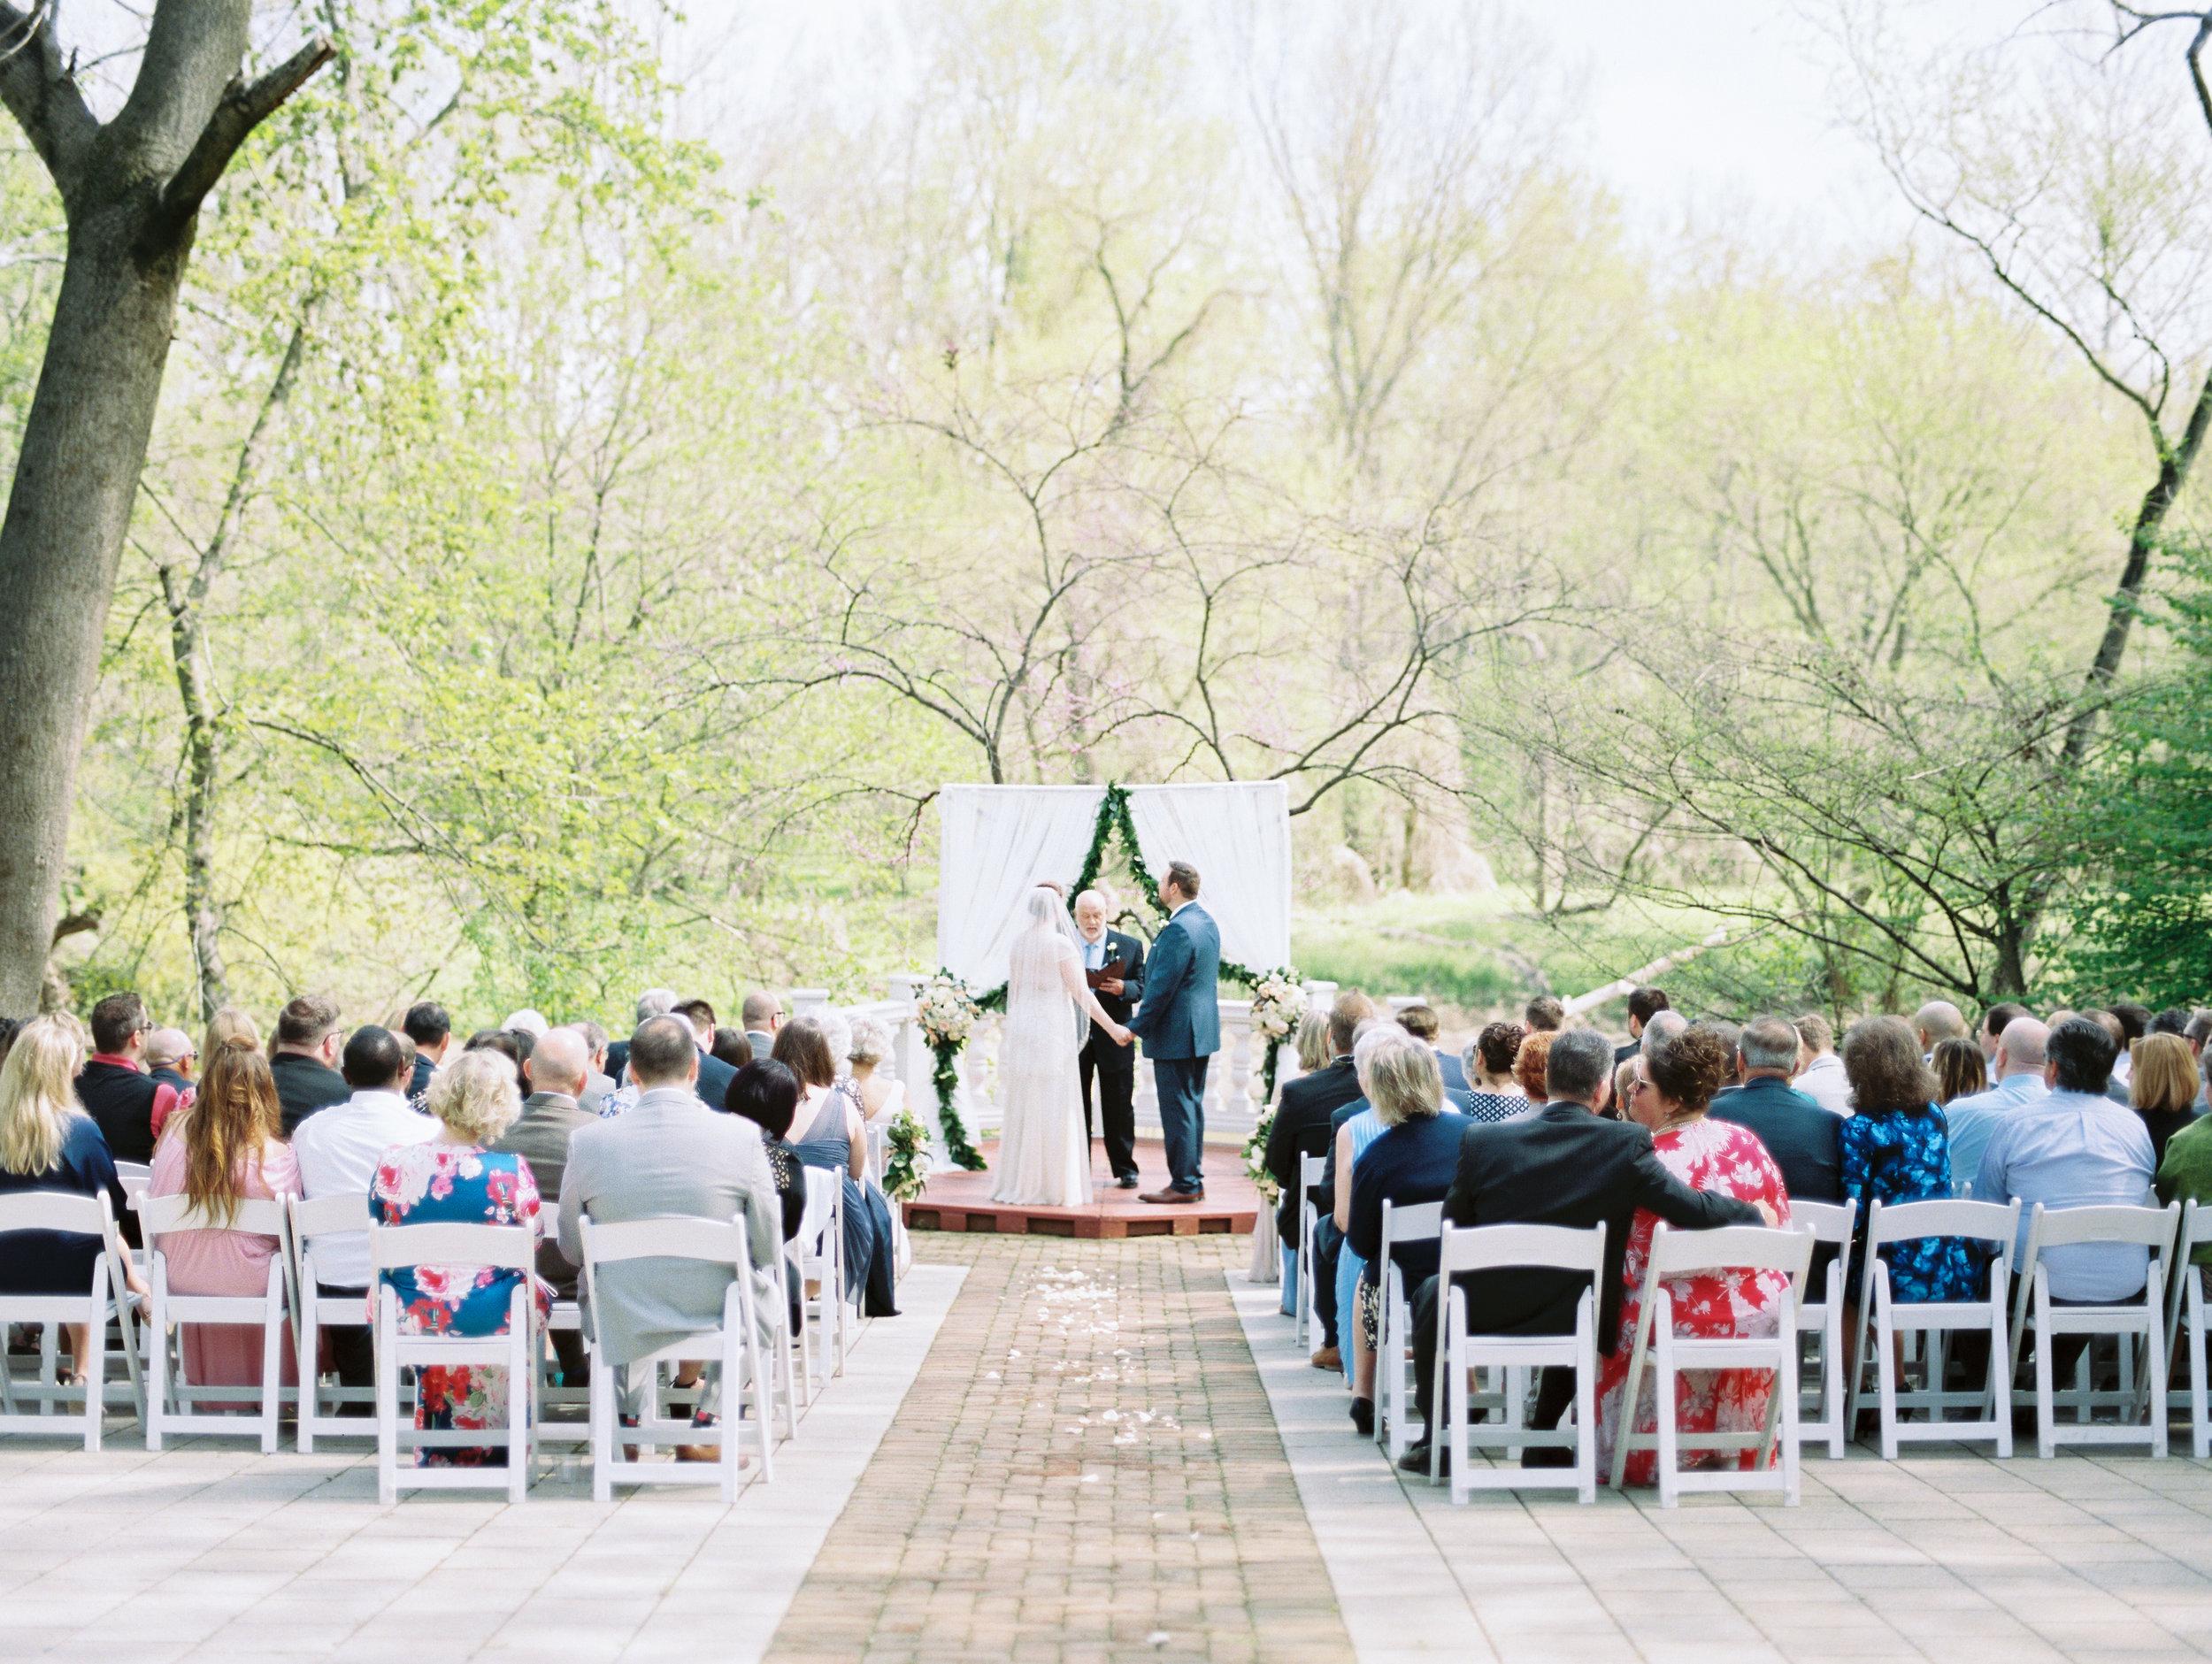 20180428-zakula-molczyk-wedding-188.jpg